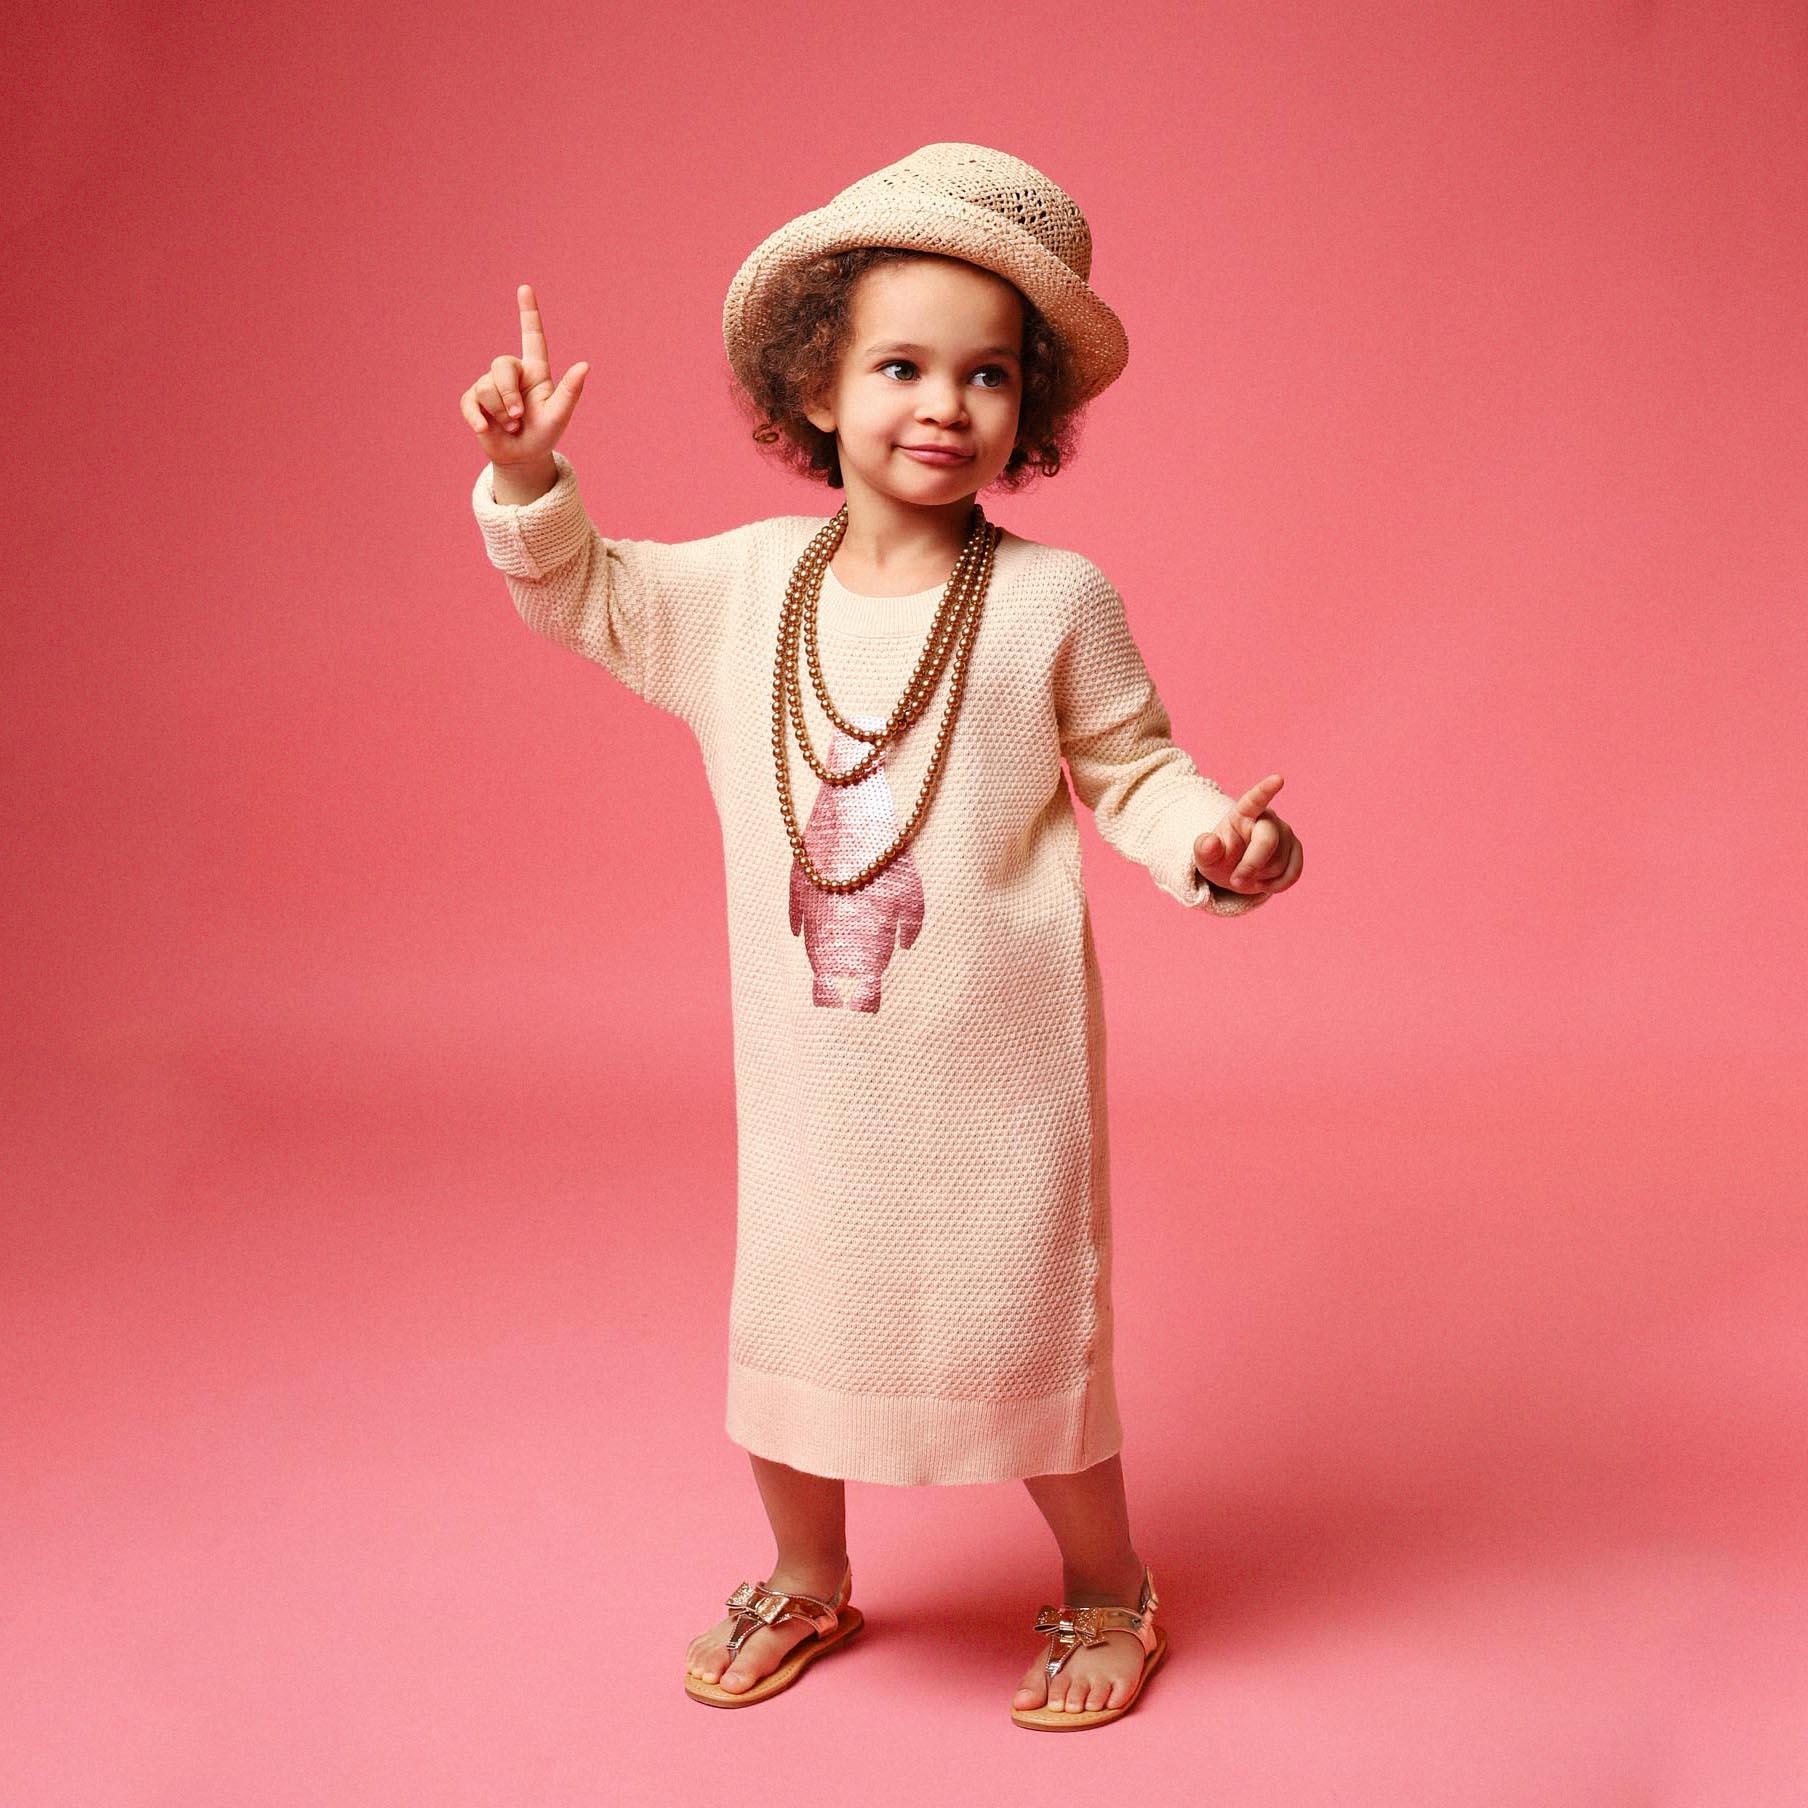 nyc-photographers-kids-modeling-100182.jpg